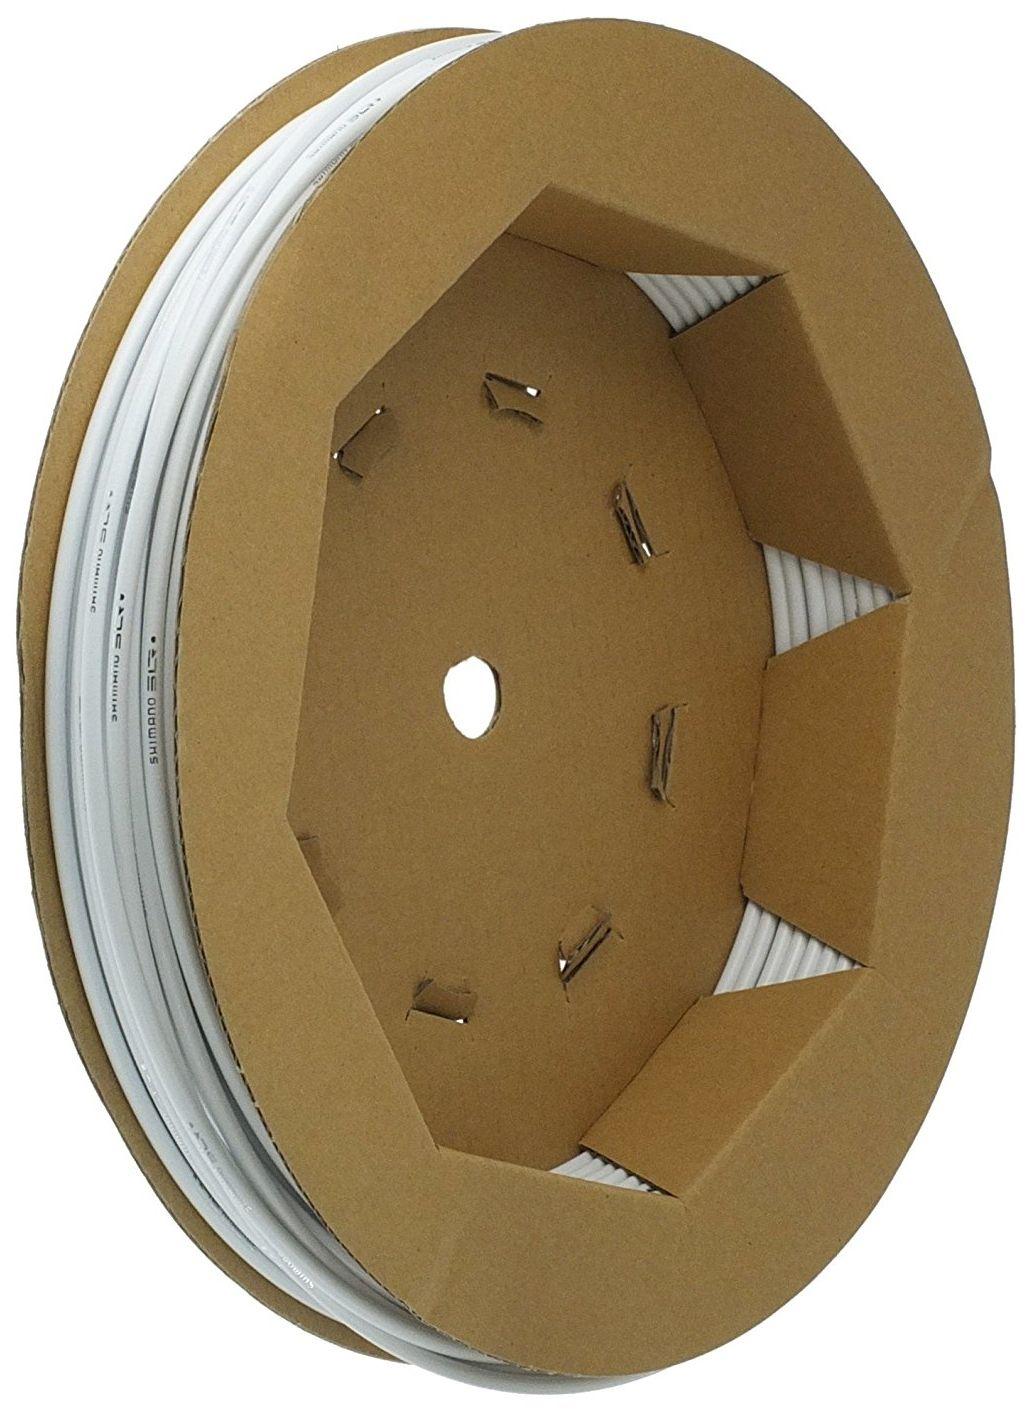 Запчасть Shimano оплетка троса тормоза SLR (Y80900015) оплетка тормоза shimano slr 40м в коробке цвет желтый y80900018